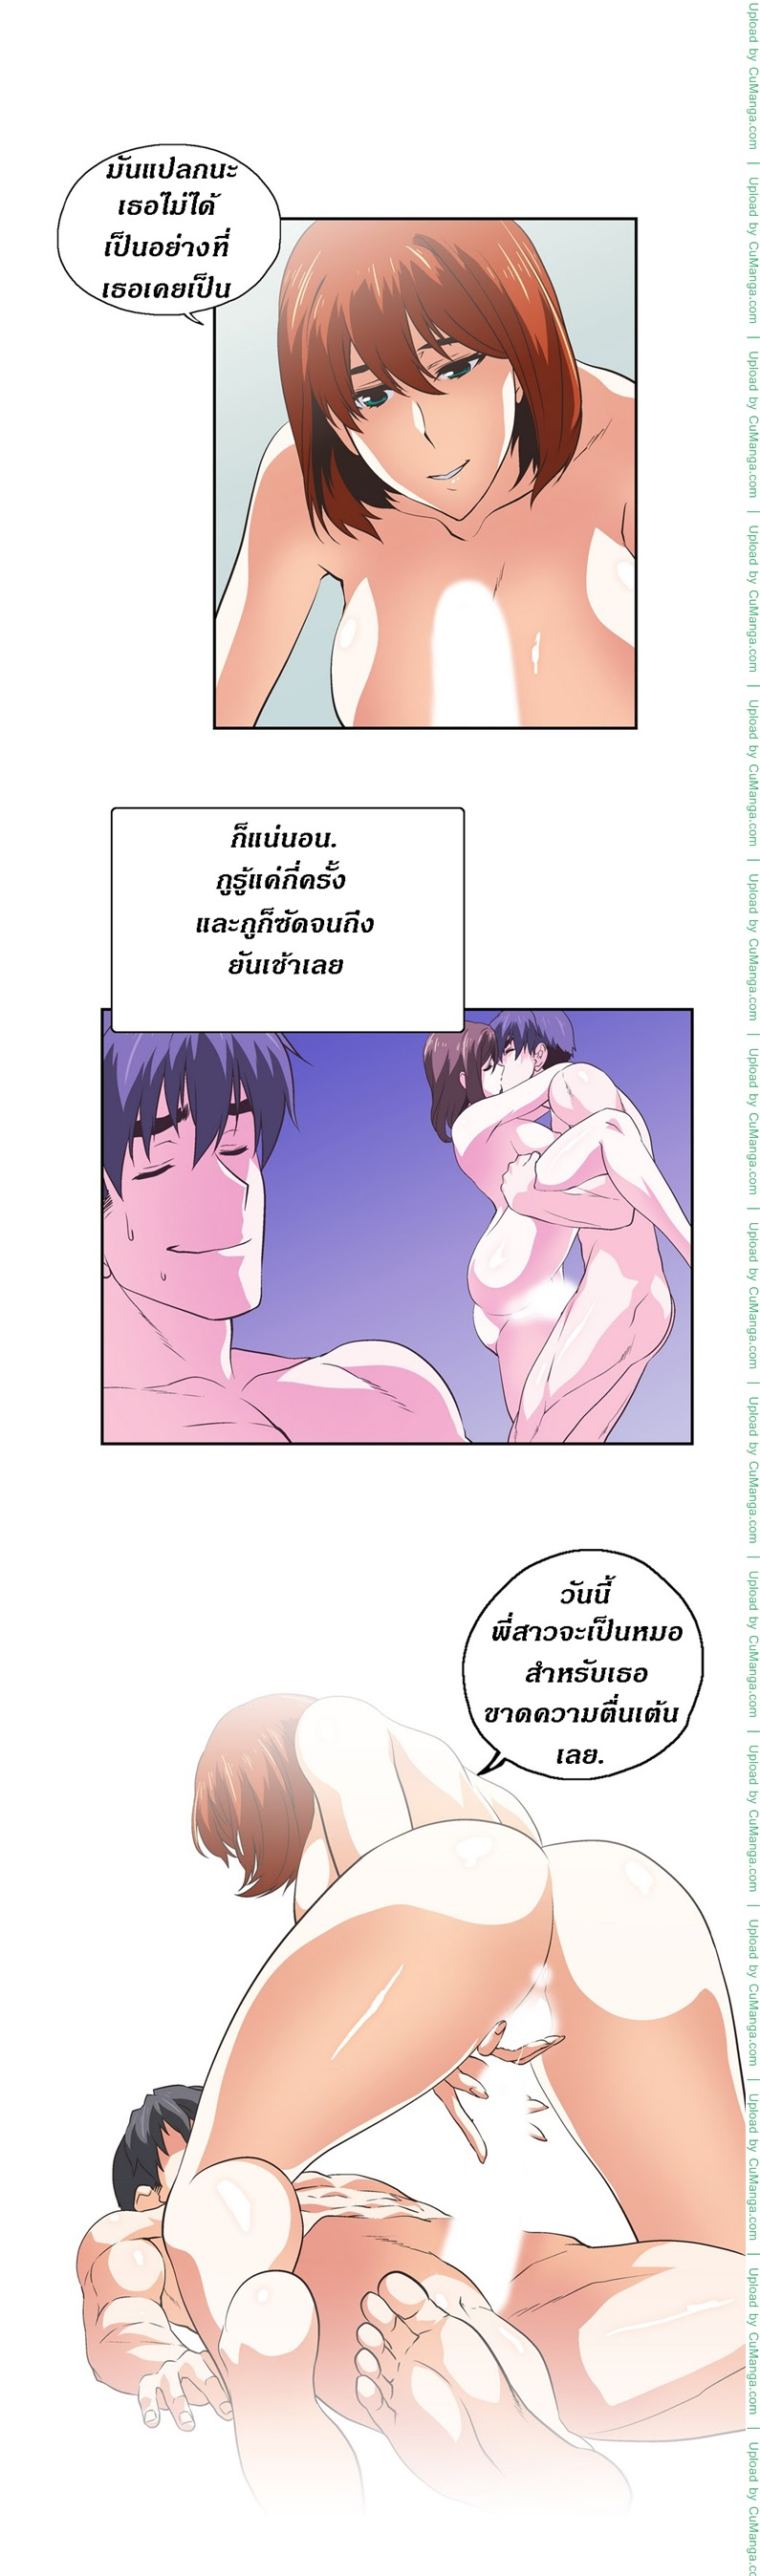 SStudy 44 - หน้า 22